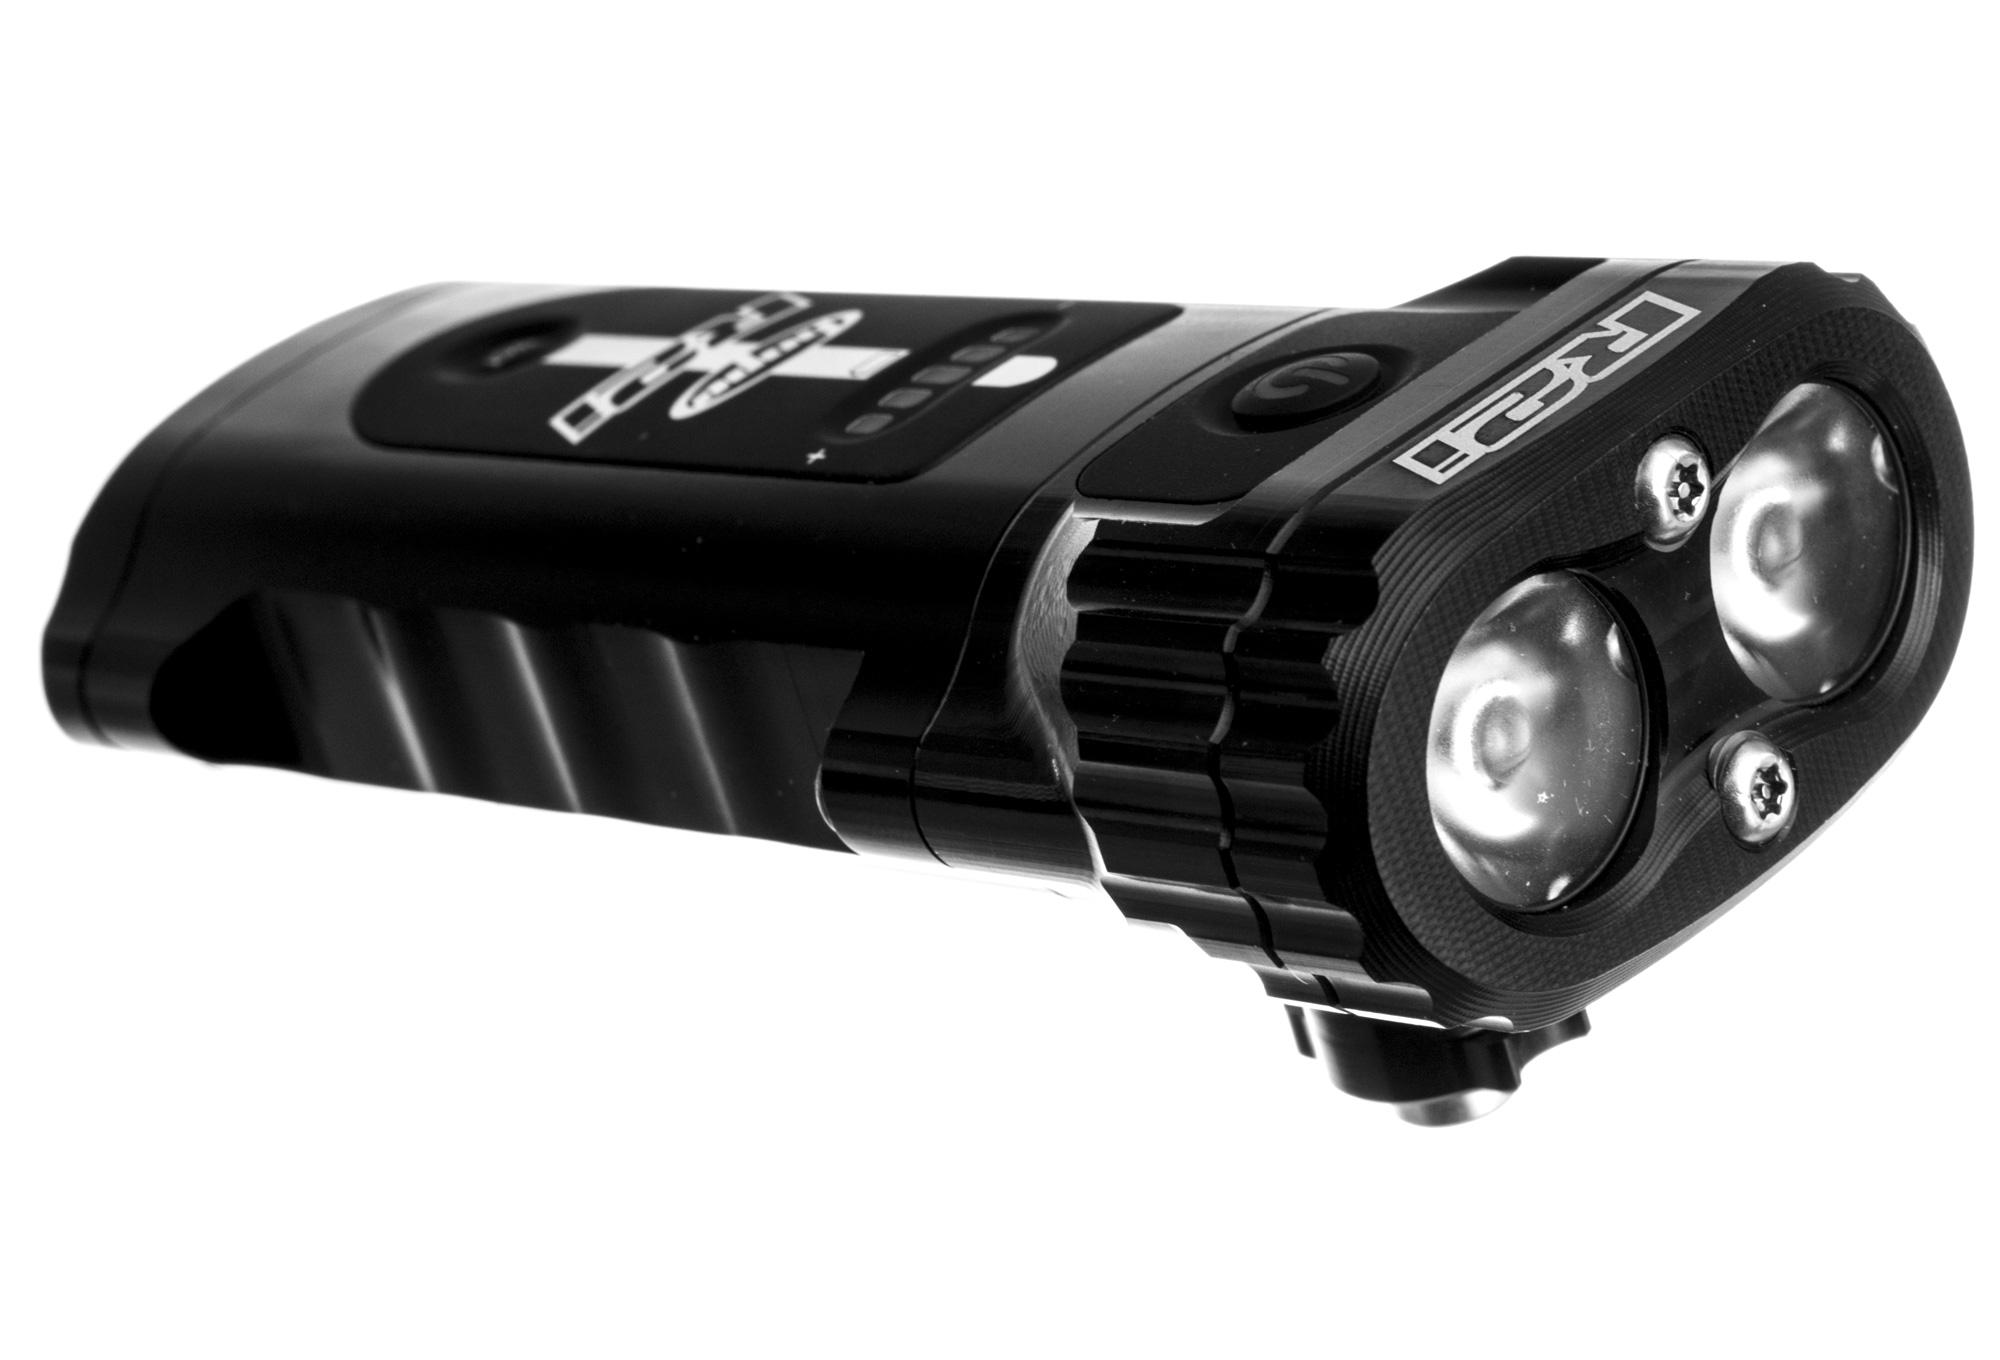 1x2 Cellules Lampe Hope Vision Batterie R2i Led Avant Noir bgfY76y